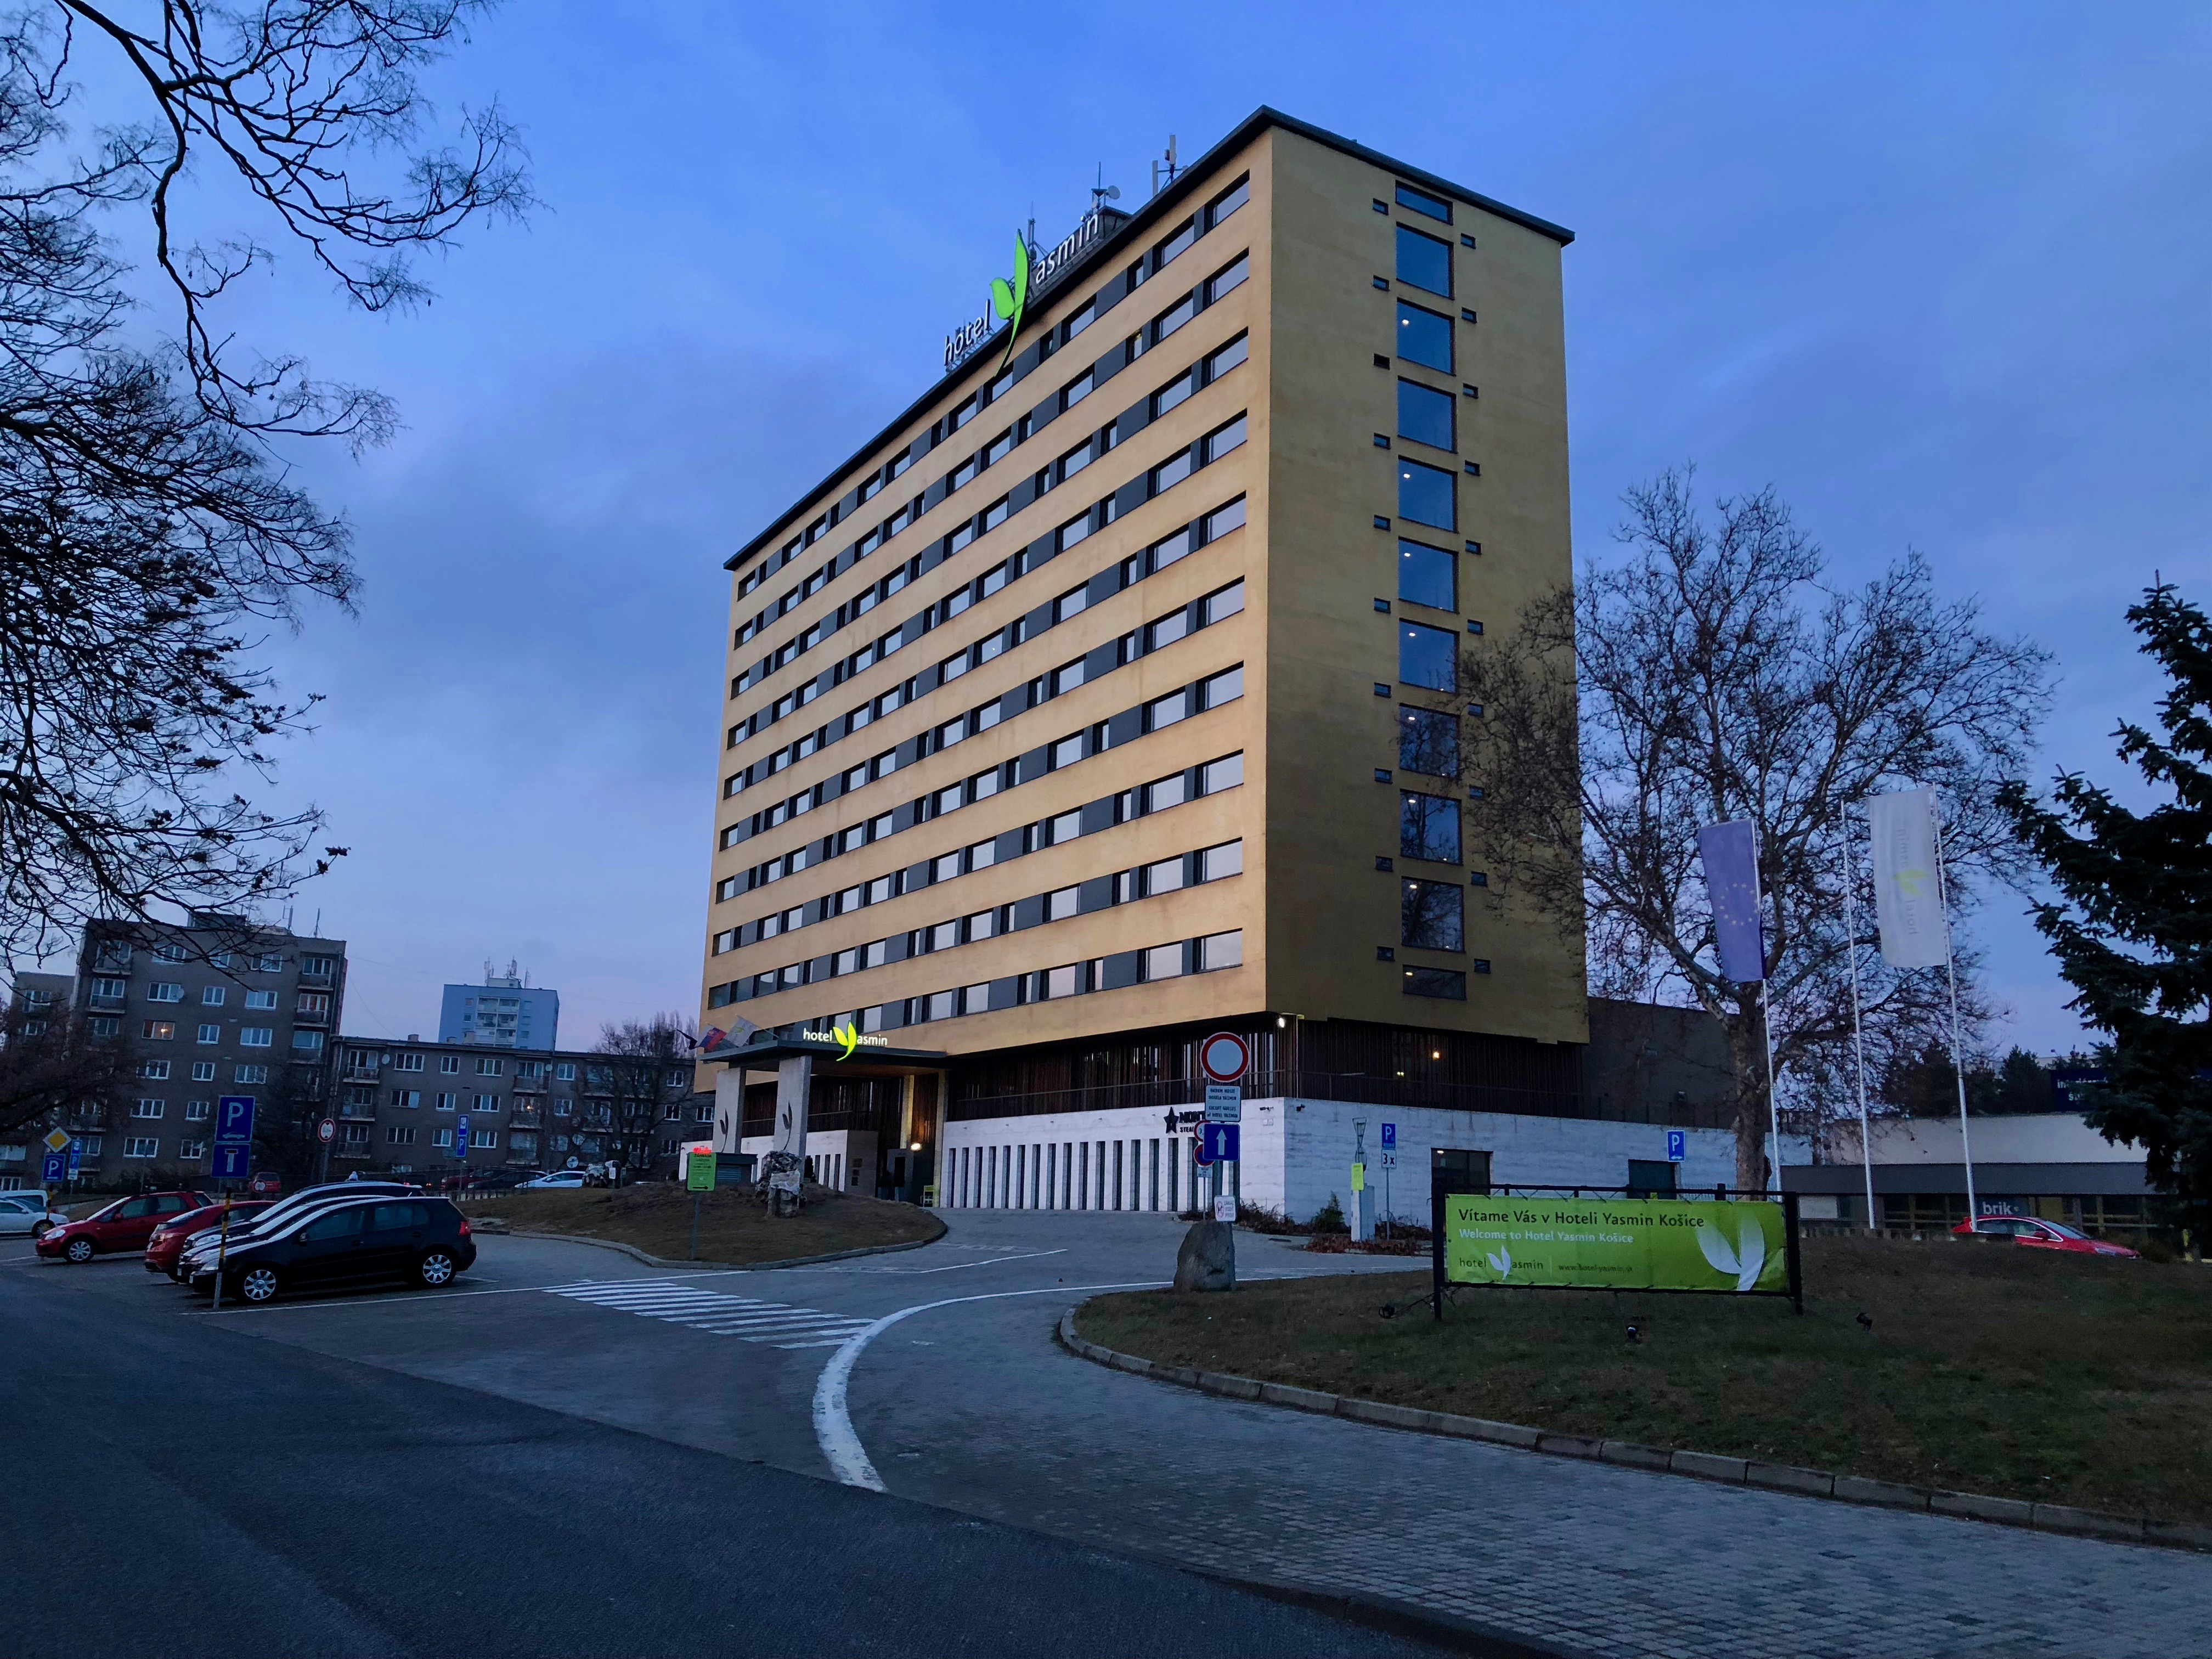 File:Hotel Yasmin Košice 2 jpg - Wikimedia Commons